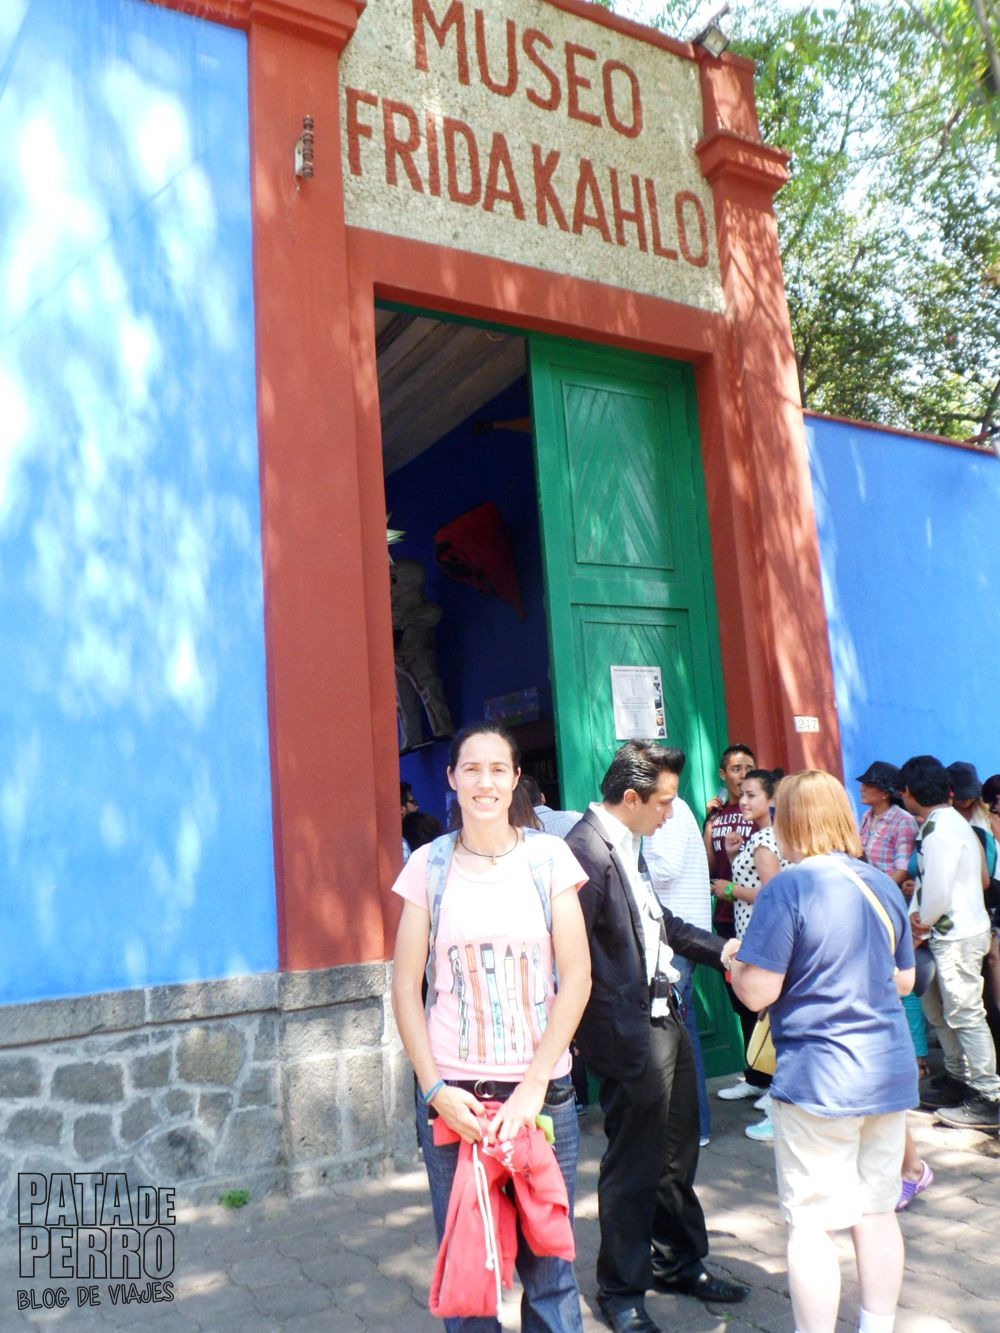 coyoacan mi primer amor en mexico pata de perro blog de viajes05